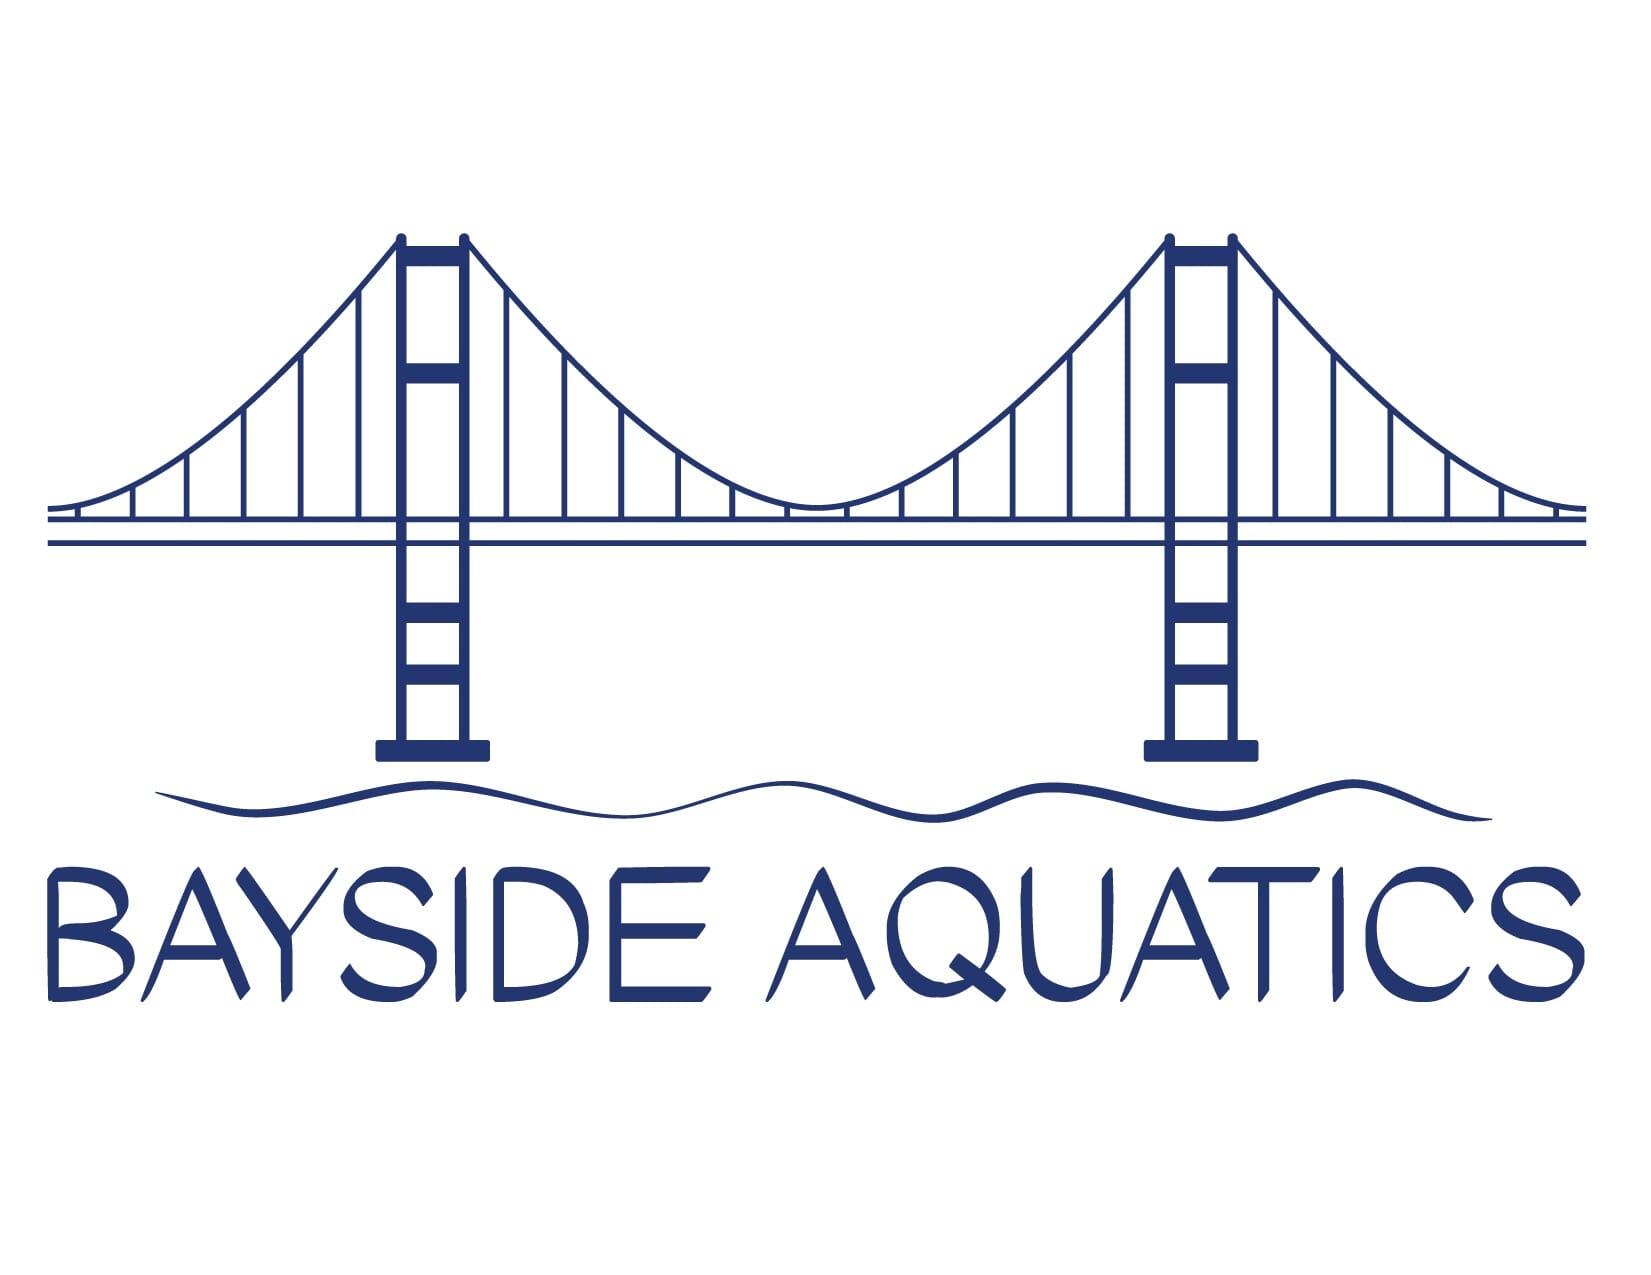 Bayside Aquatics logo